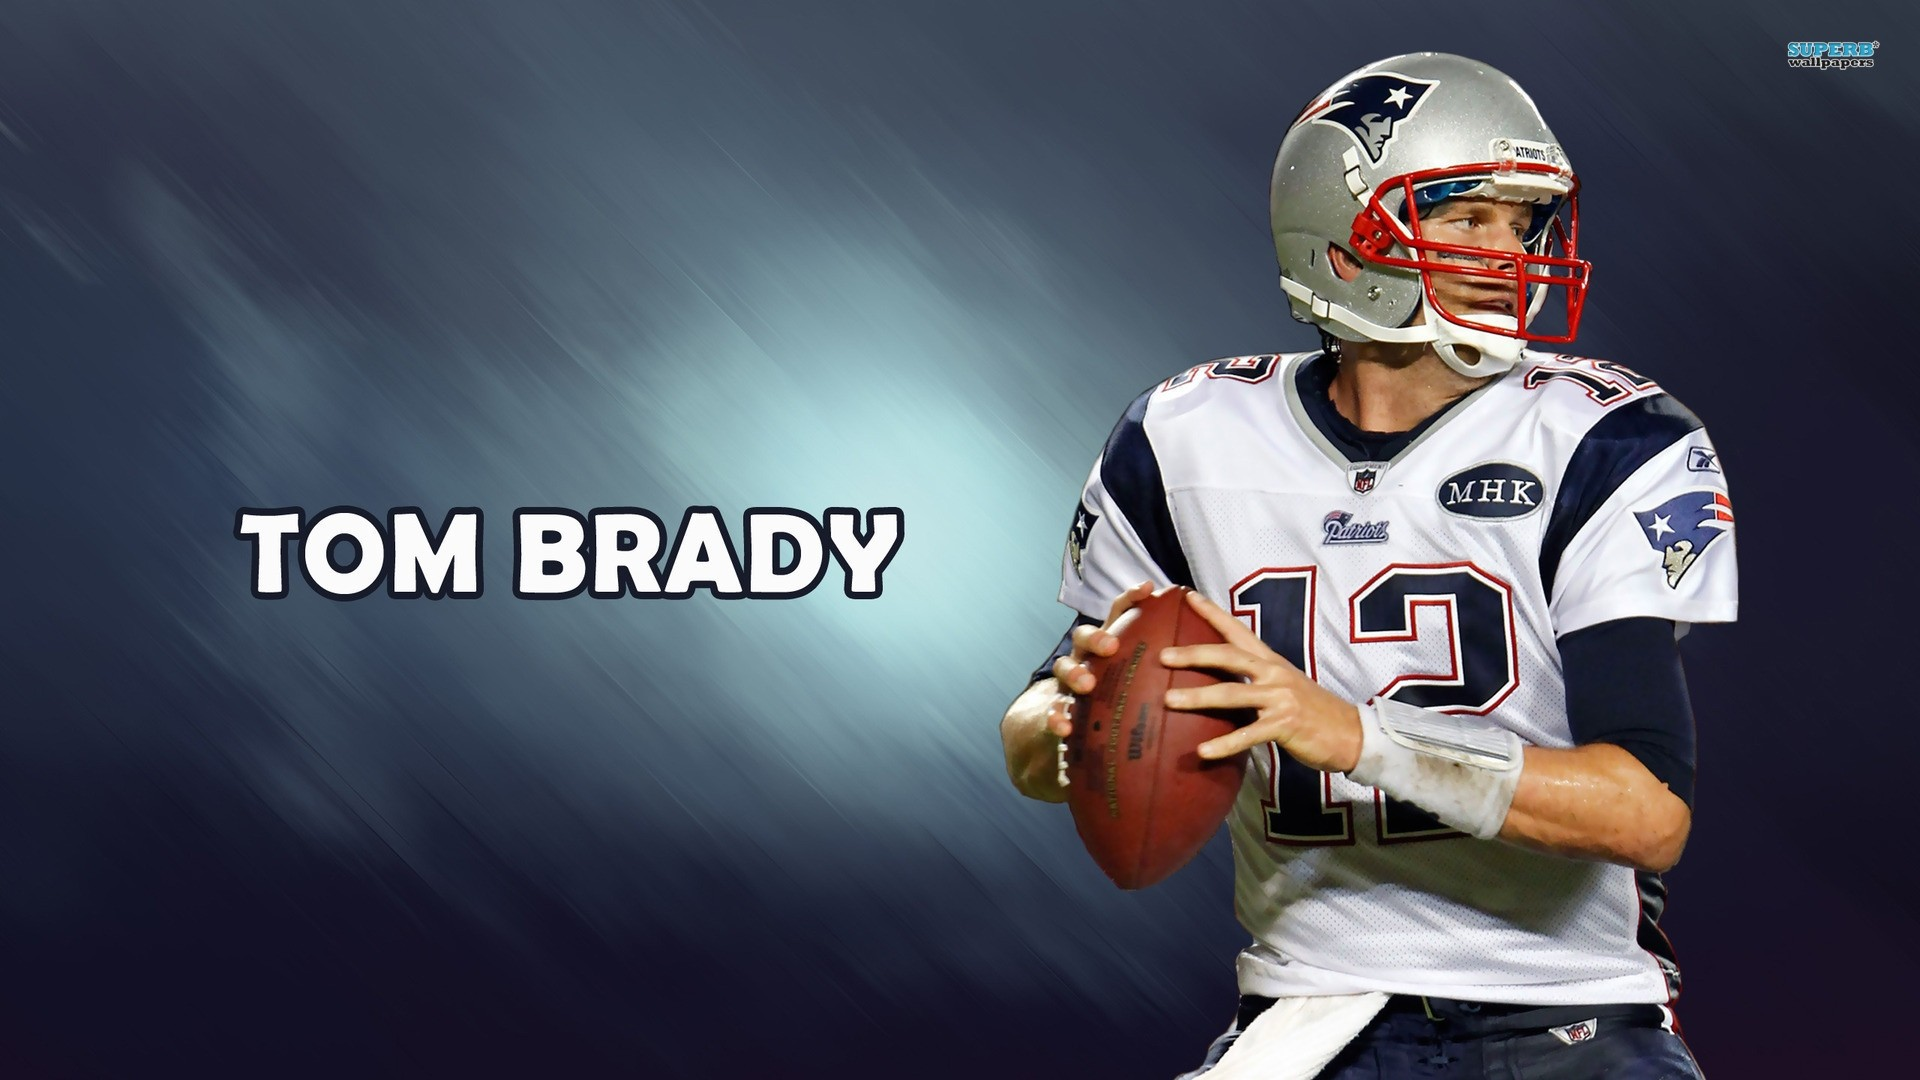 Tom Brady Desktop Wallpaper